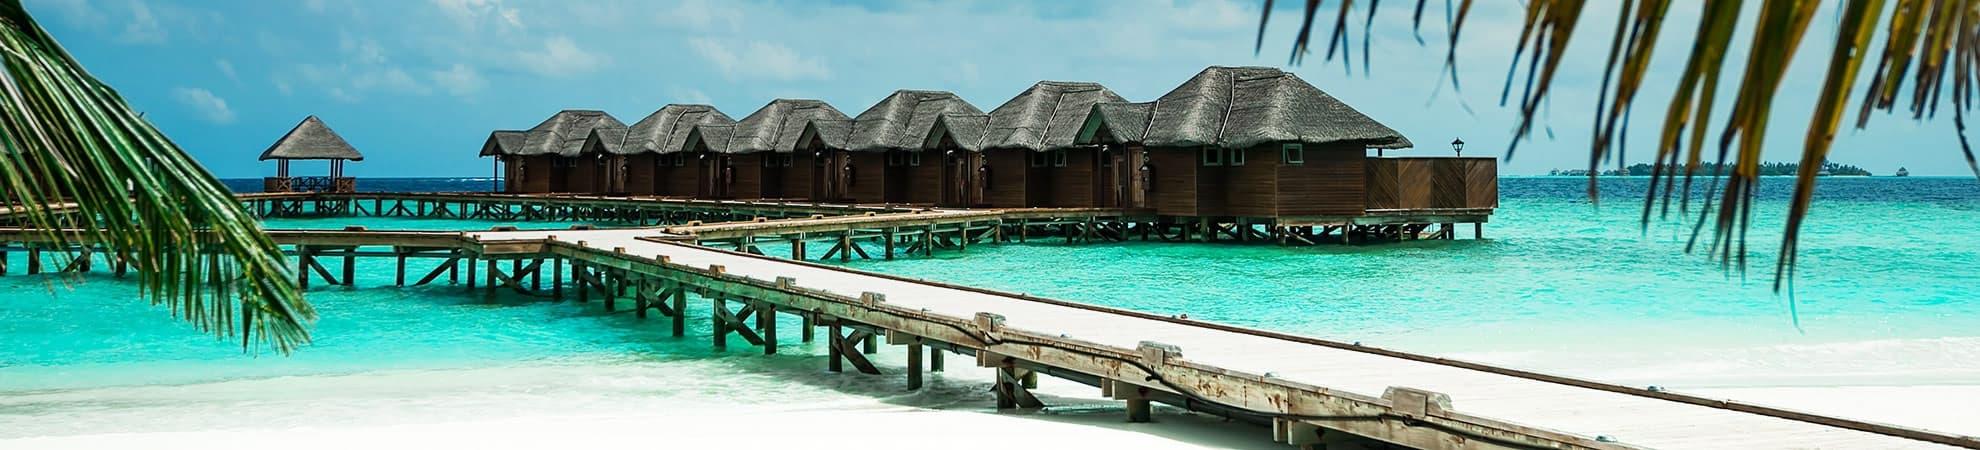 Voyage Les Maldives